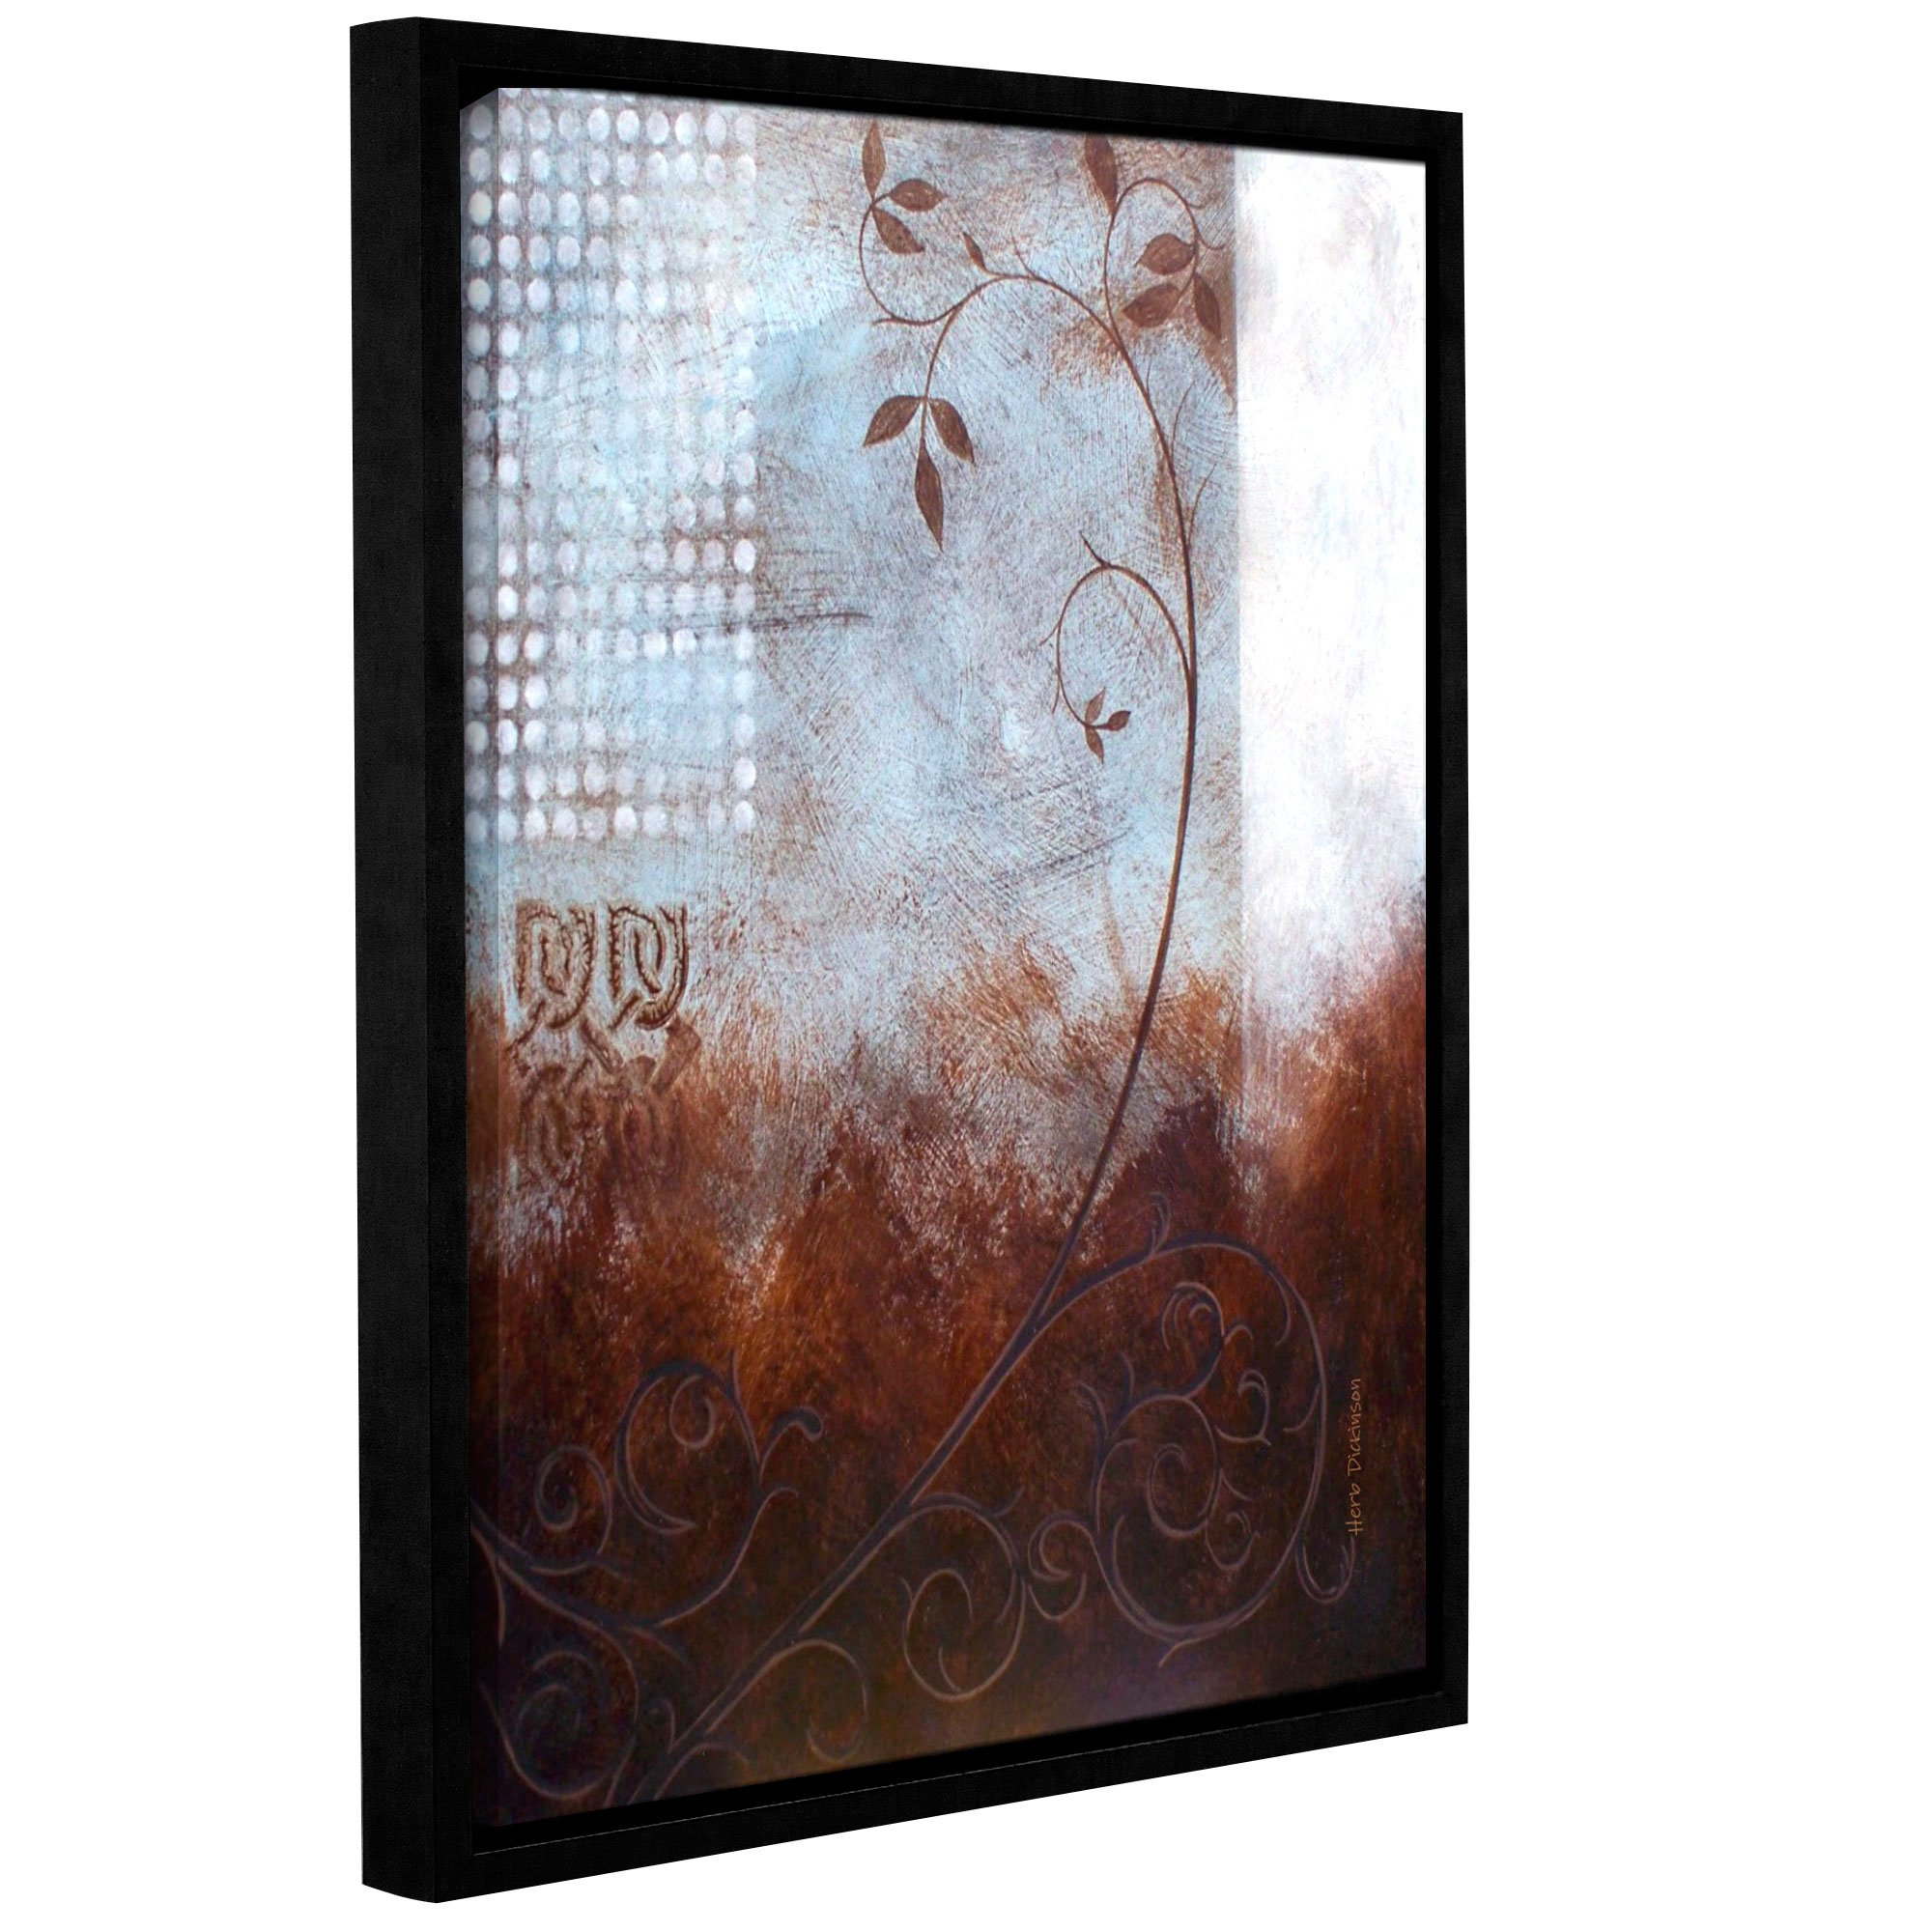 18 x 24 ArtWall Herb Dickinsons Splashy Umber Art Appeelz Removable Graphic Wall Art